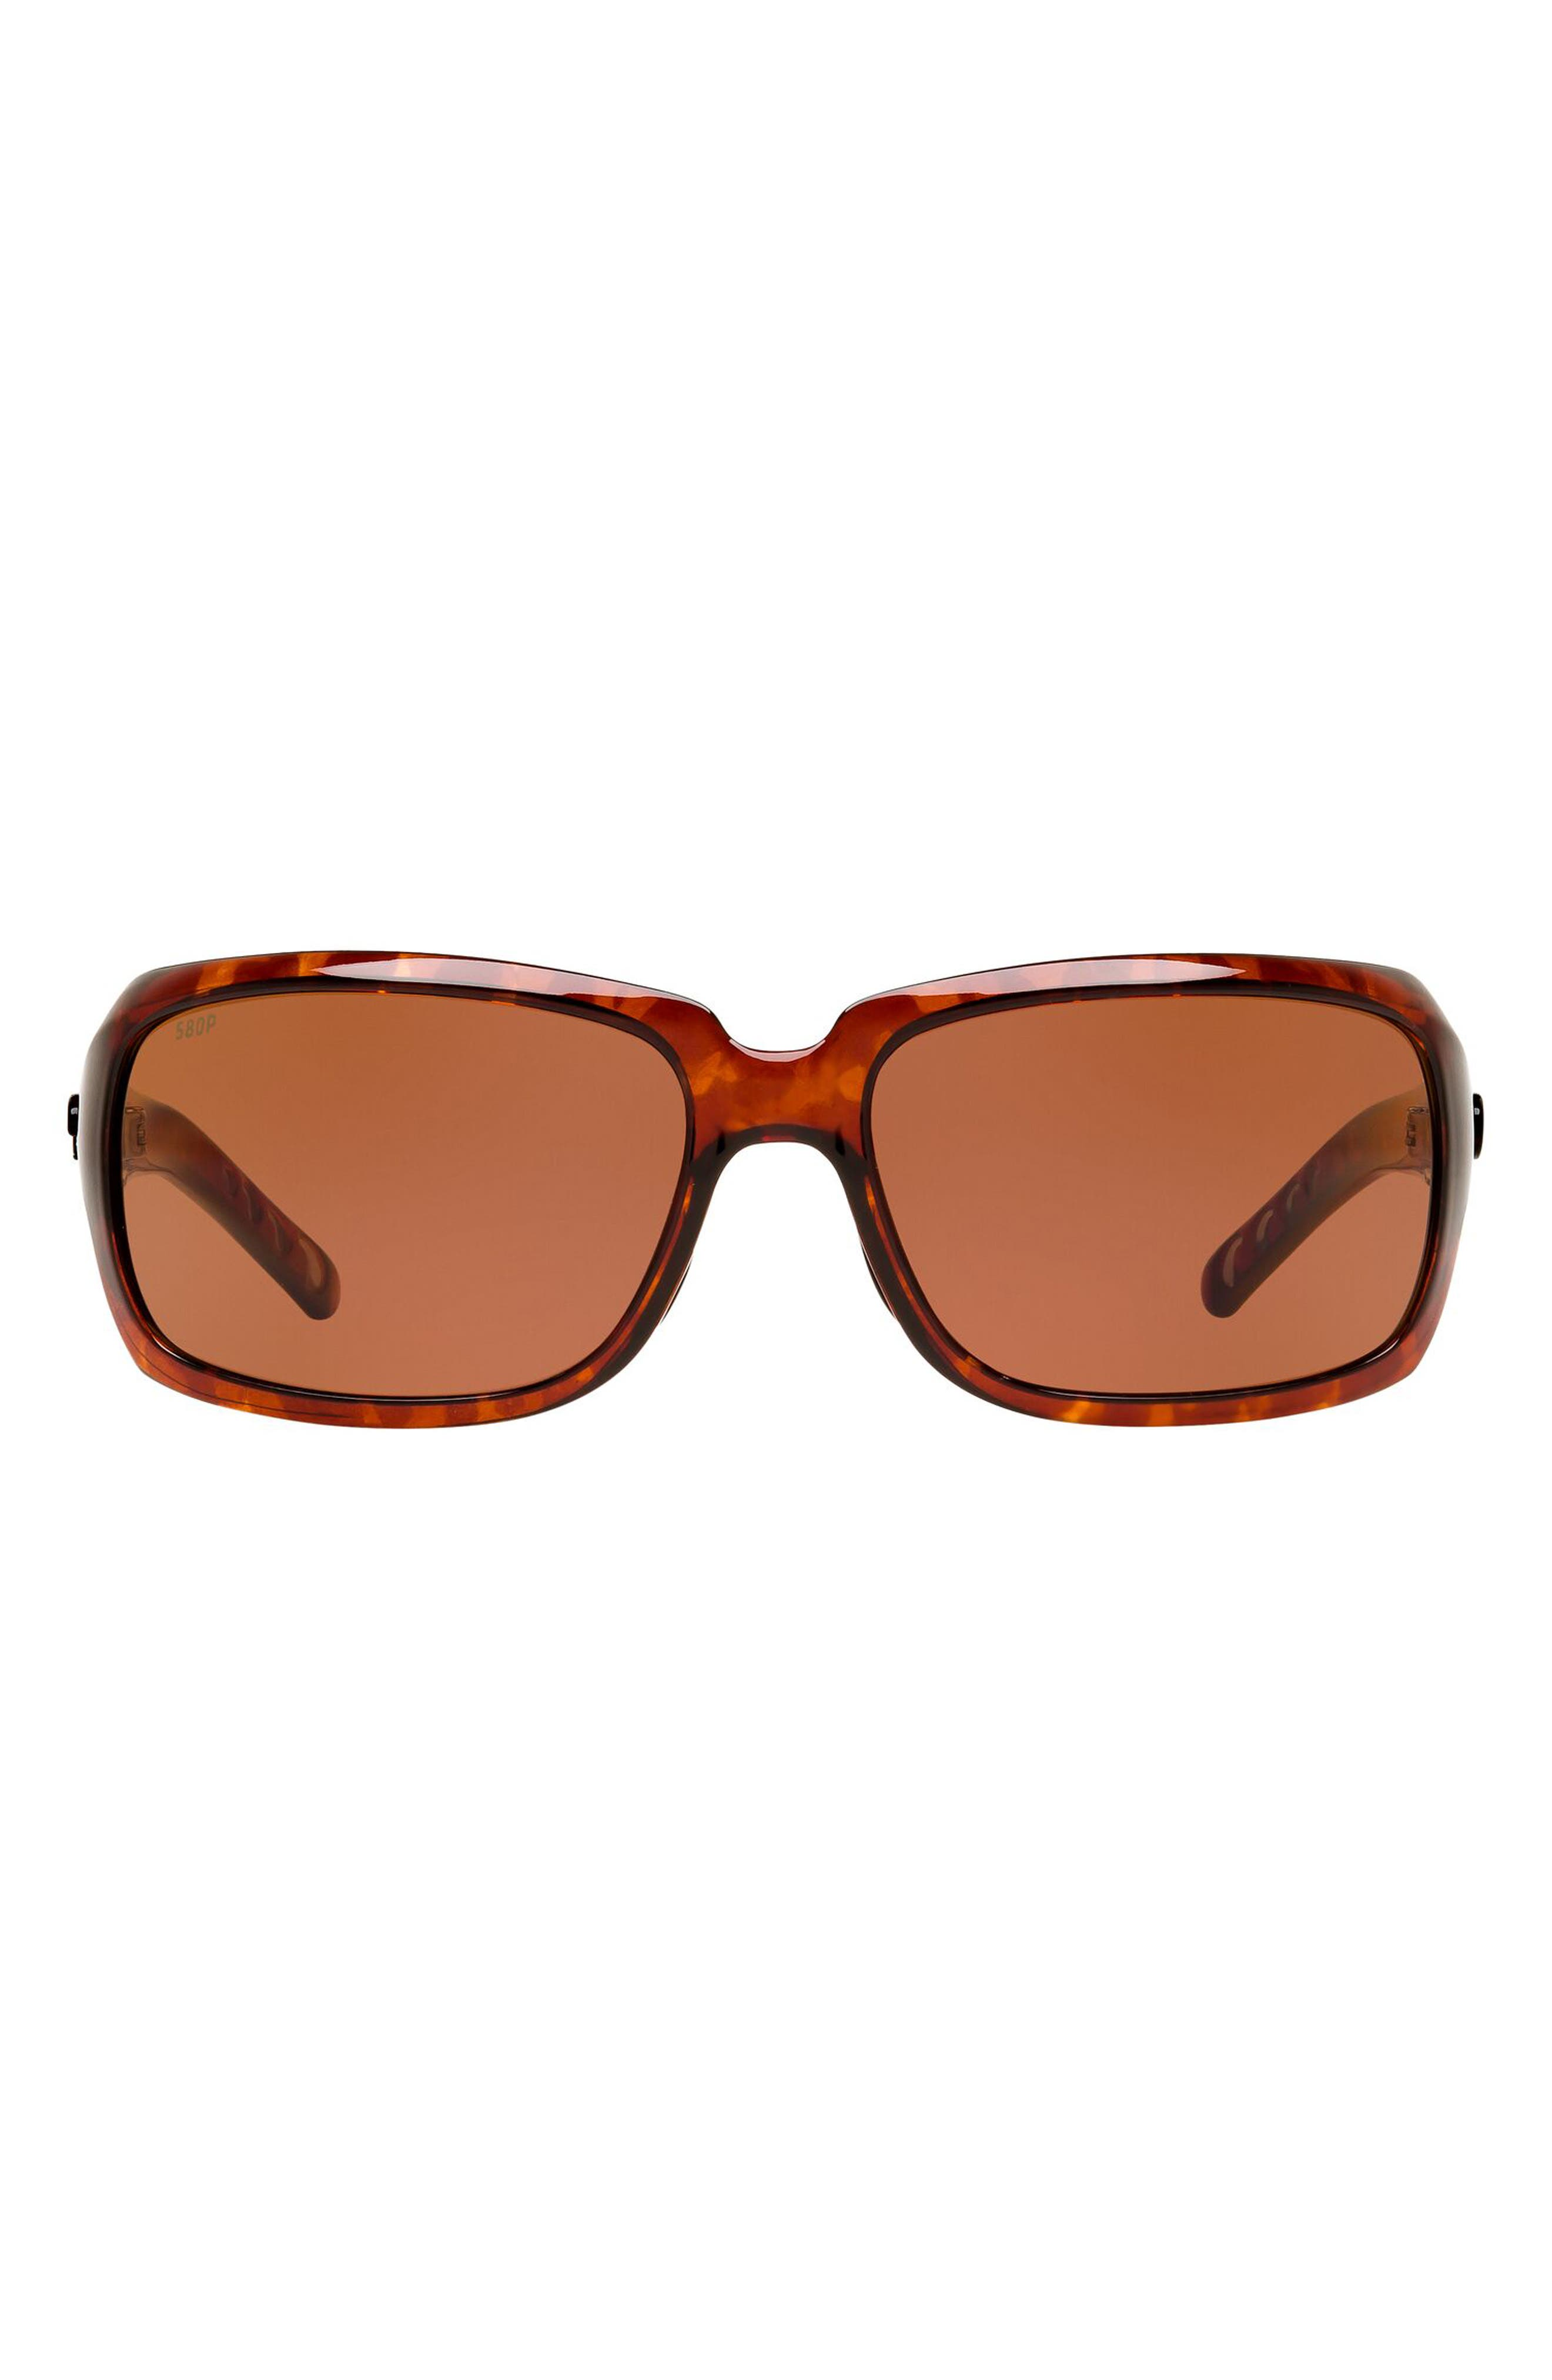 64mm Polarized Sunglasses